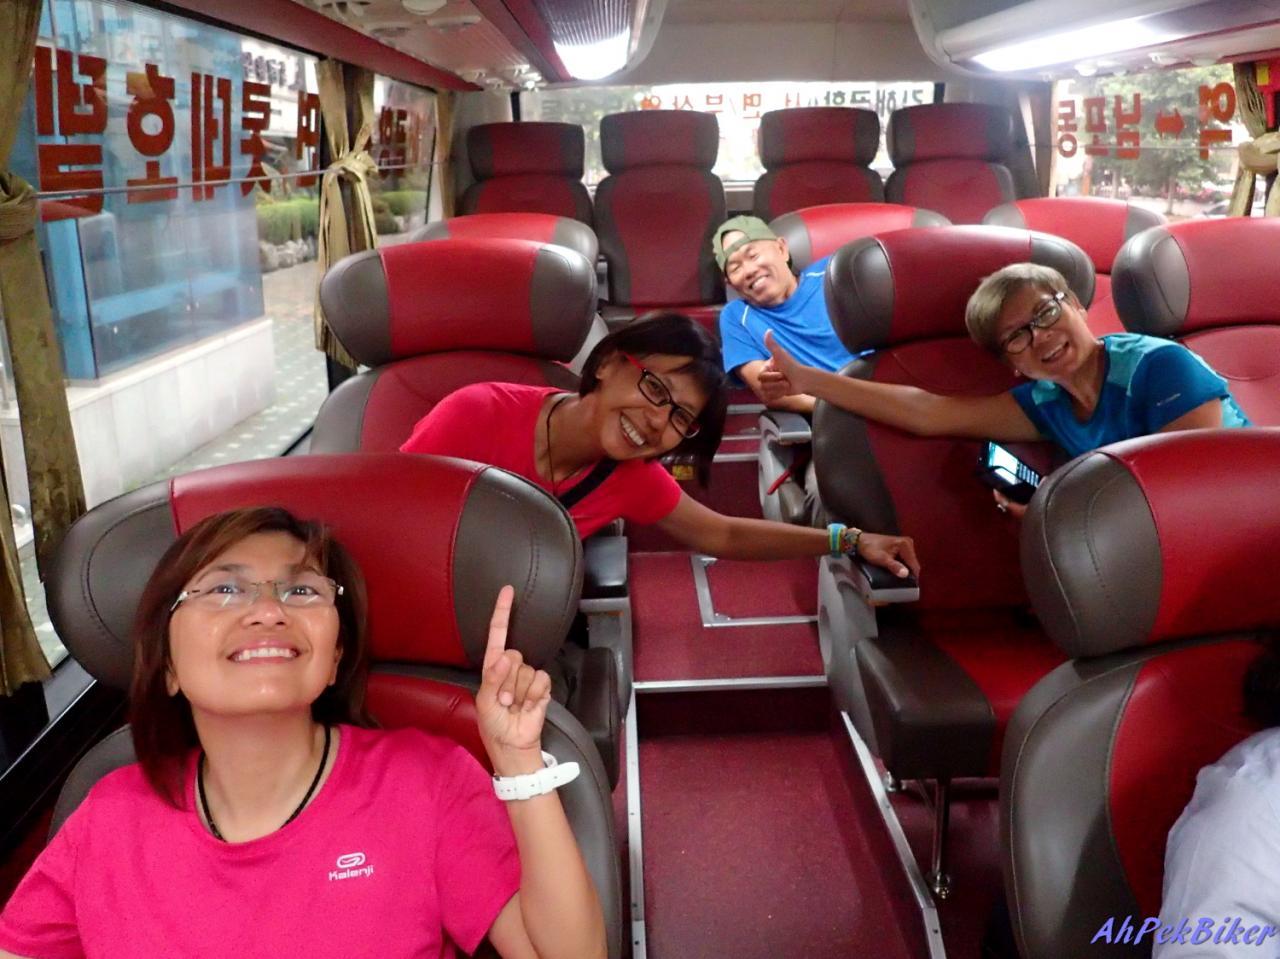 26 Cyclist On Airport Limo Bus Busan Gimhae Airport D16 Busan South Korea Cycling 5621 1 - Vé xe đi Campuchia nhân dịp lễ 2-9